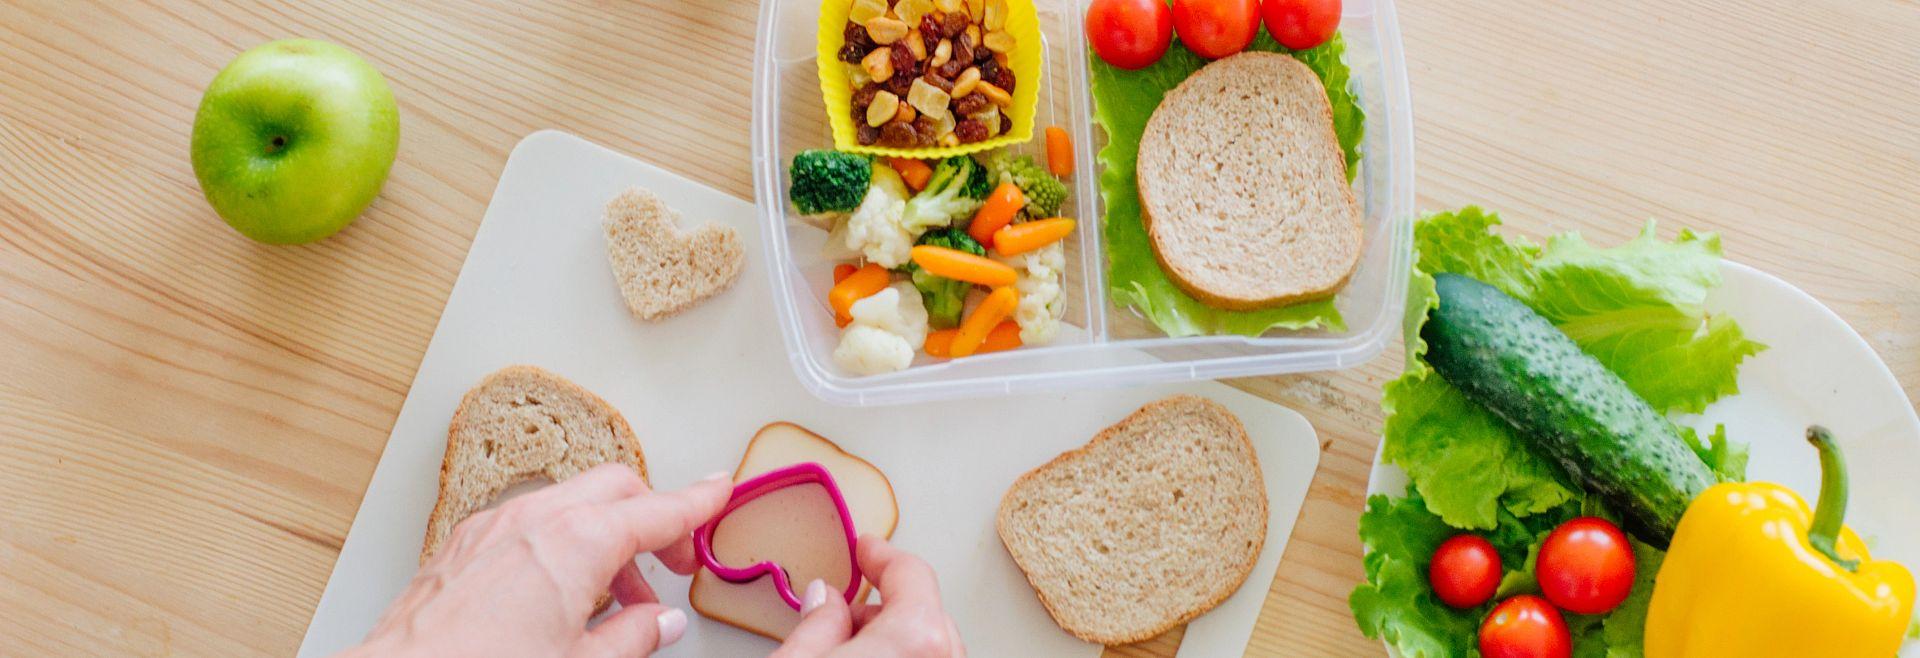 Preparing Sandwich Lunch Box Getty Images